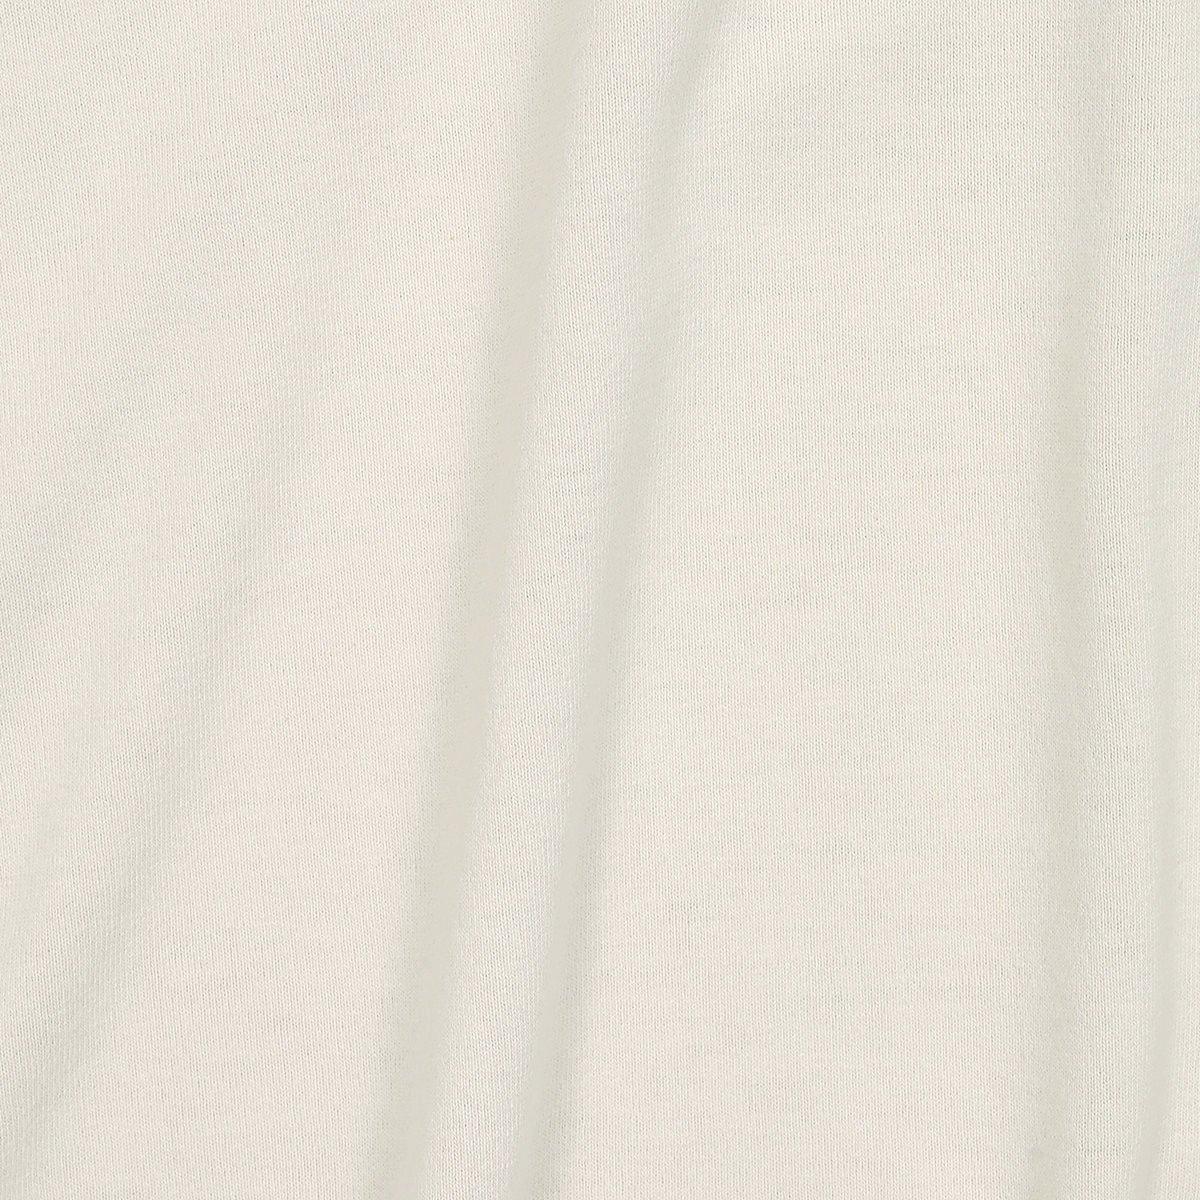 Short Sleeve RIB T-shirts 詳細画像23